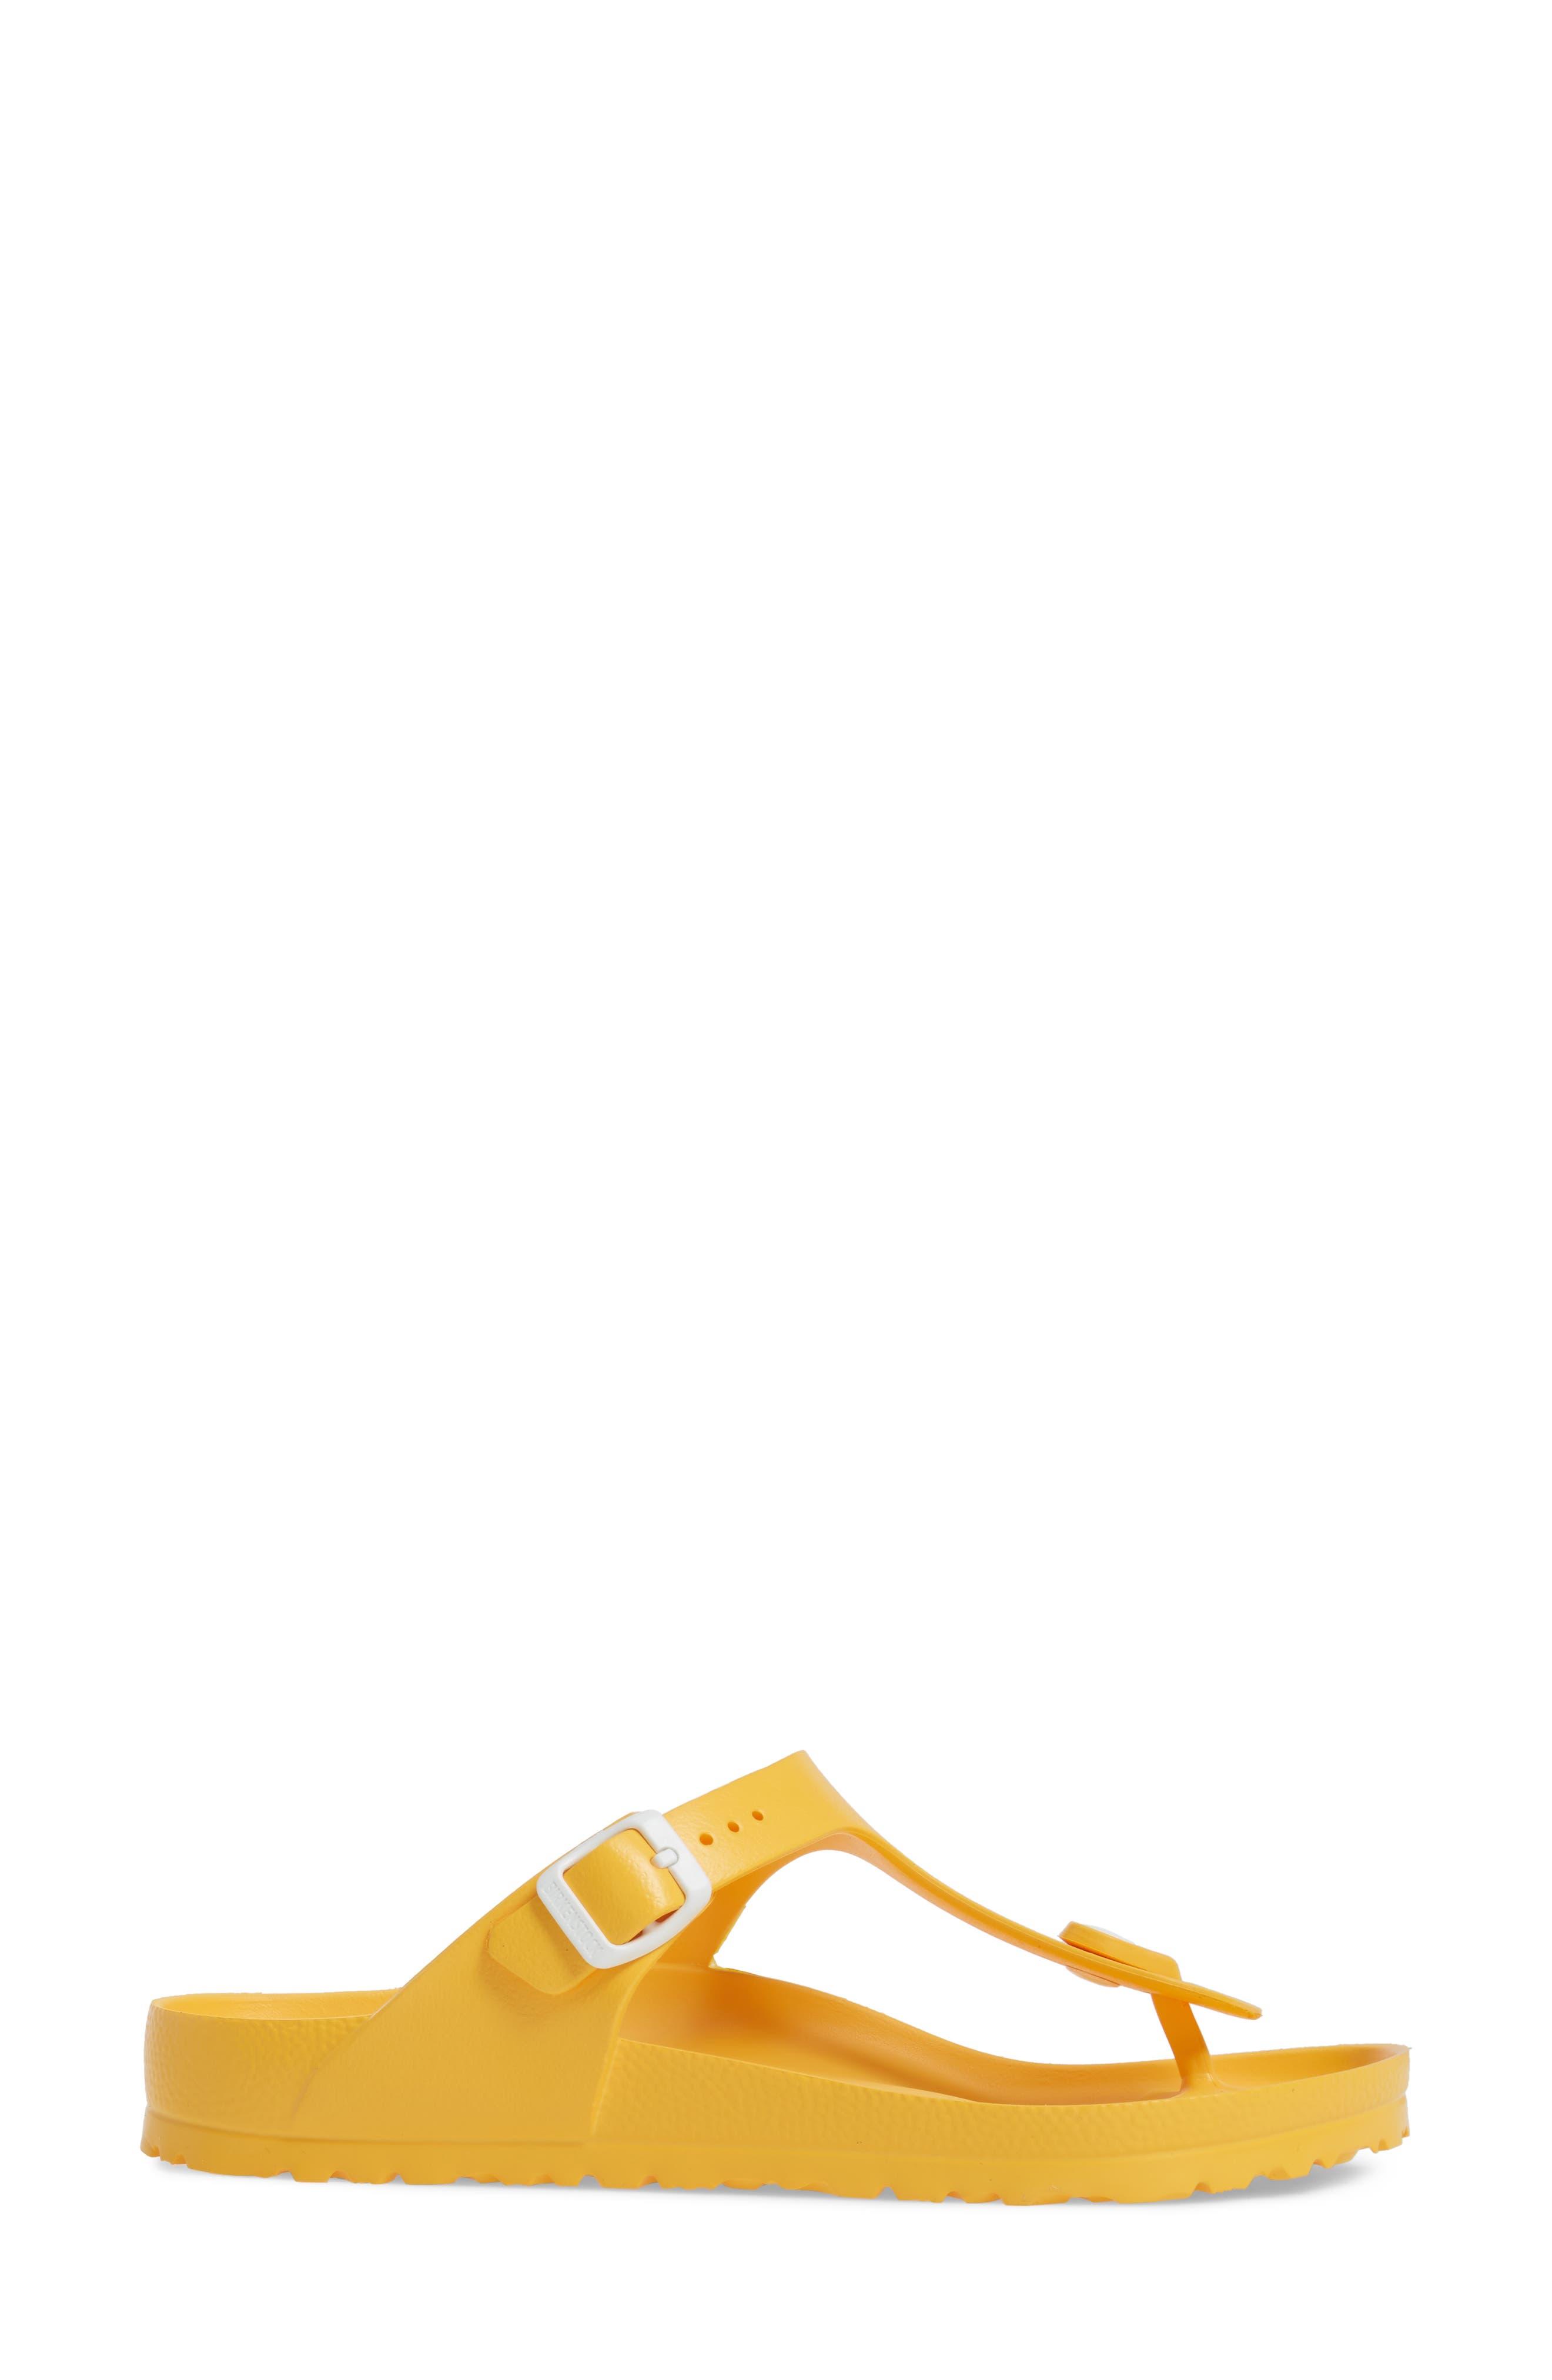 Alternate Image 3  - Birkenstock Gizeh EVA Flip Flop (Women)